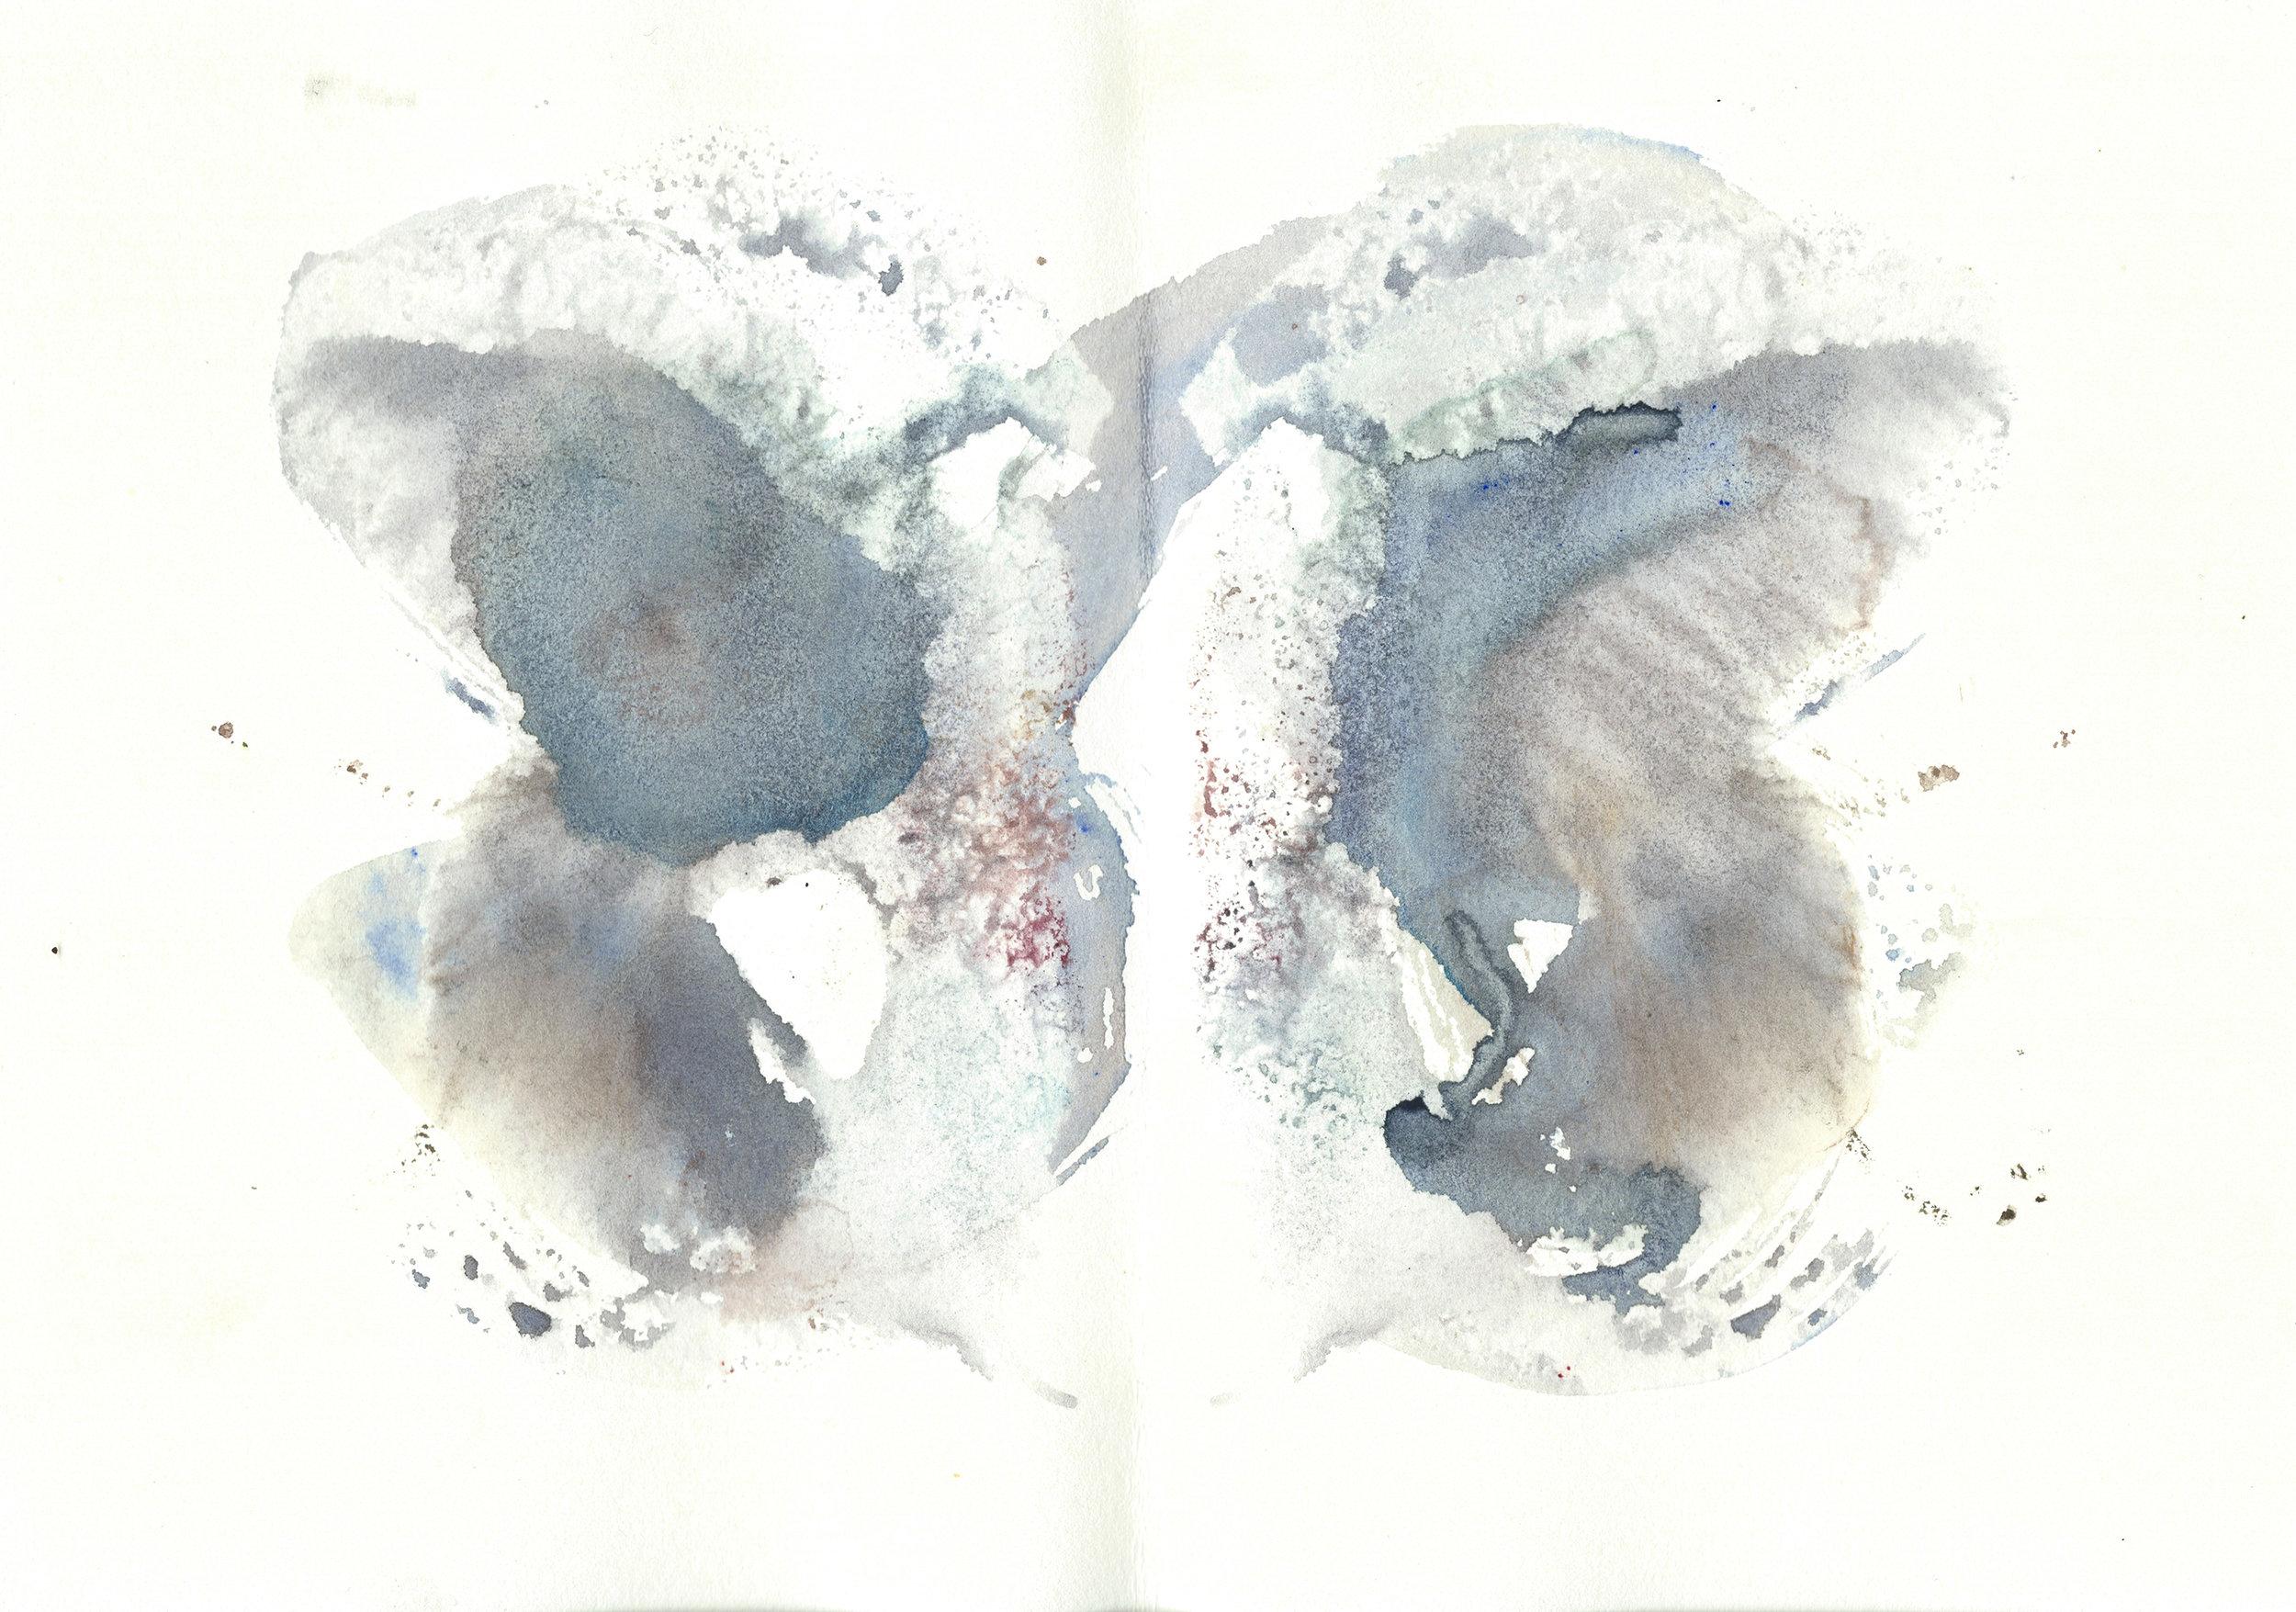 Stephen Thomas, Yoga, Yoga-Svarupa, watercolor 03